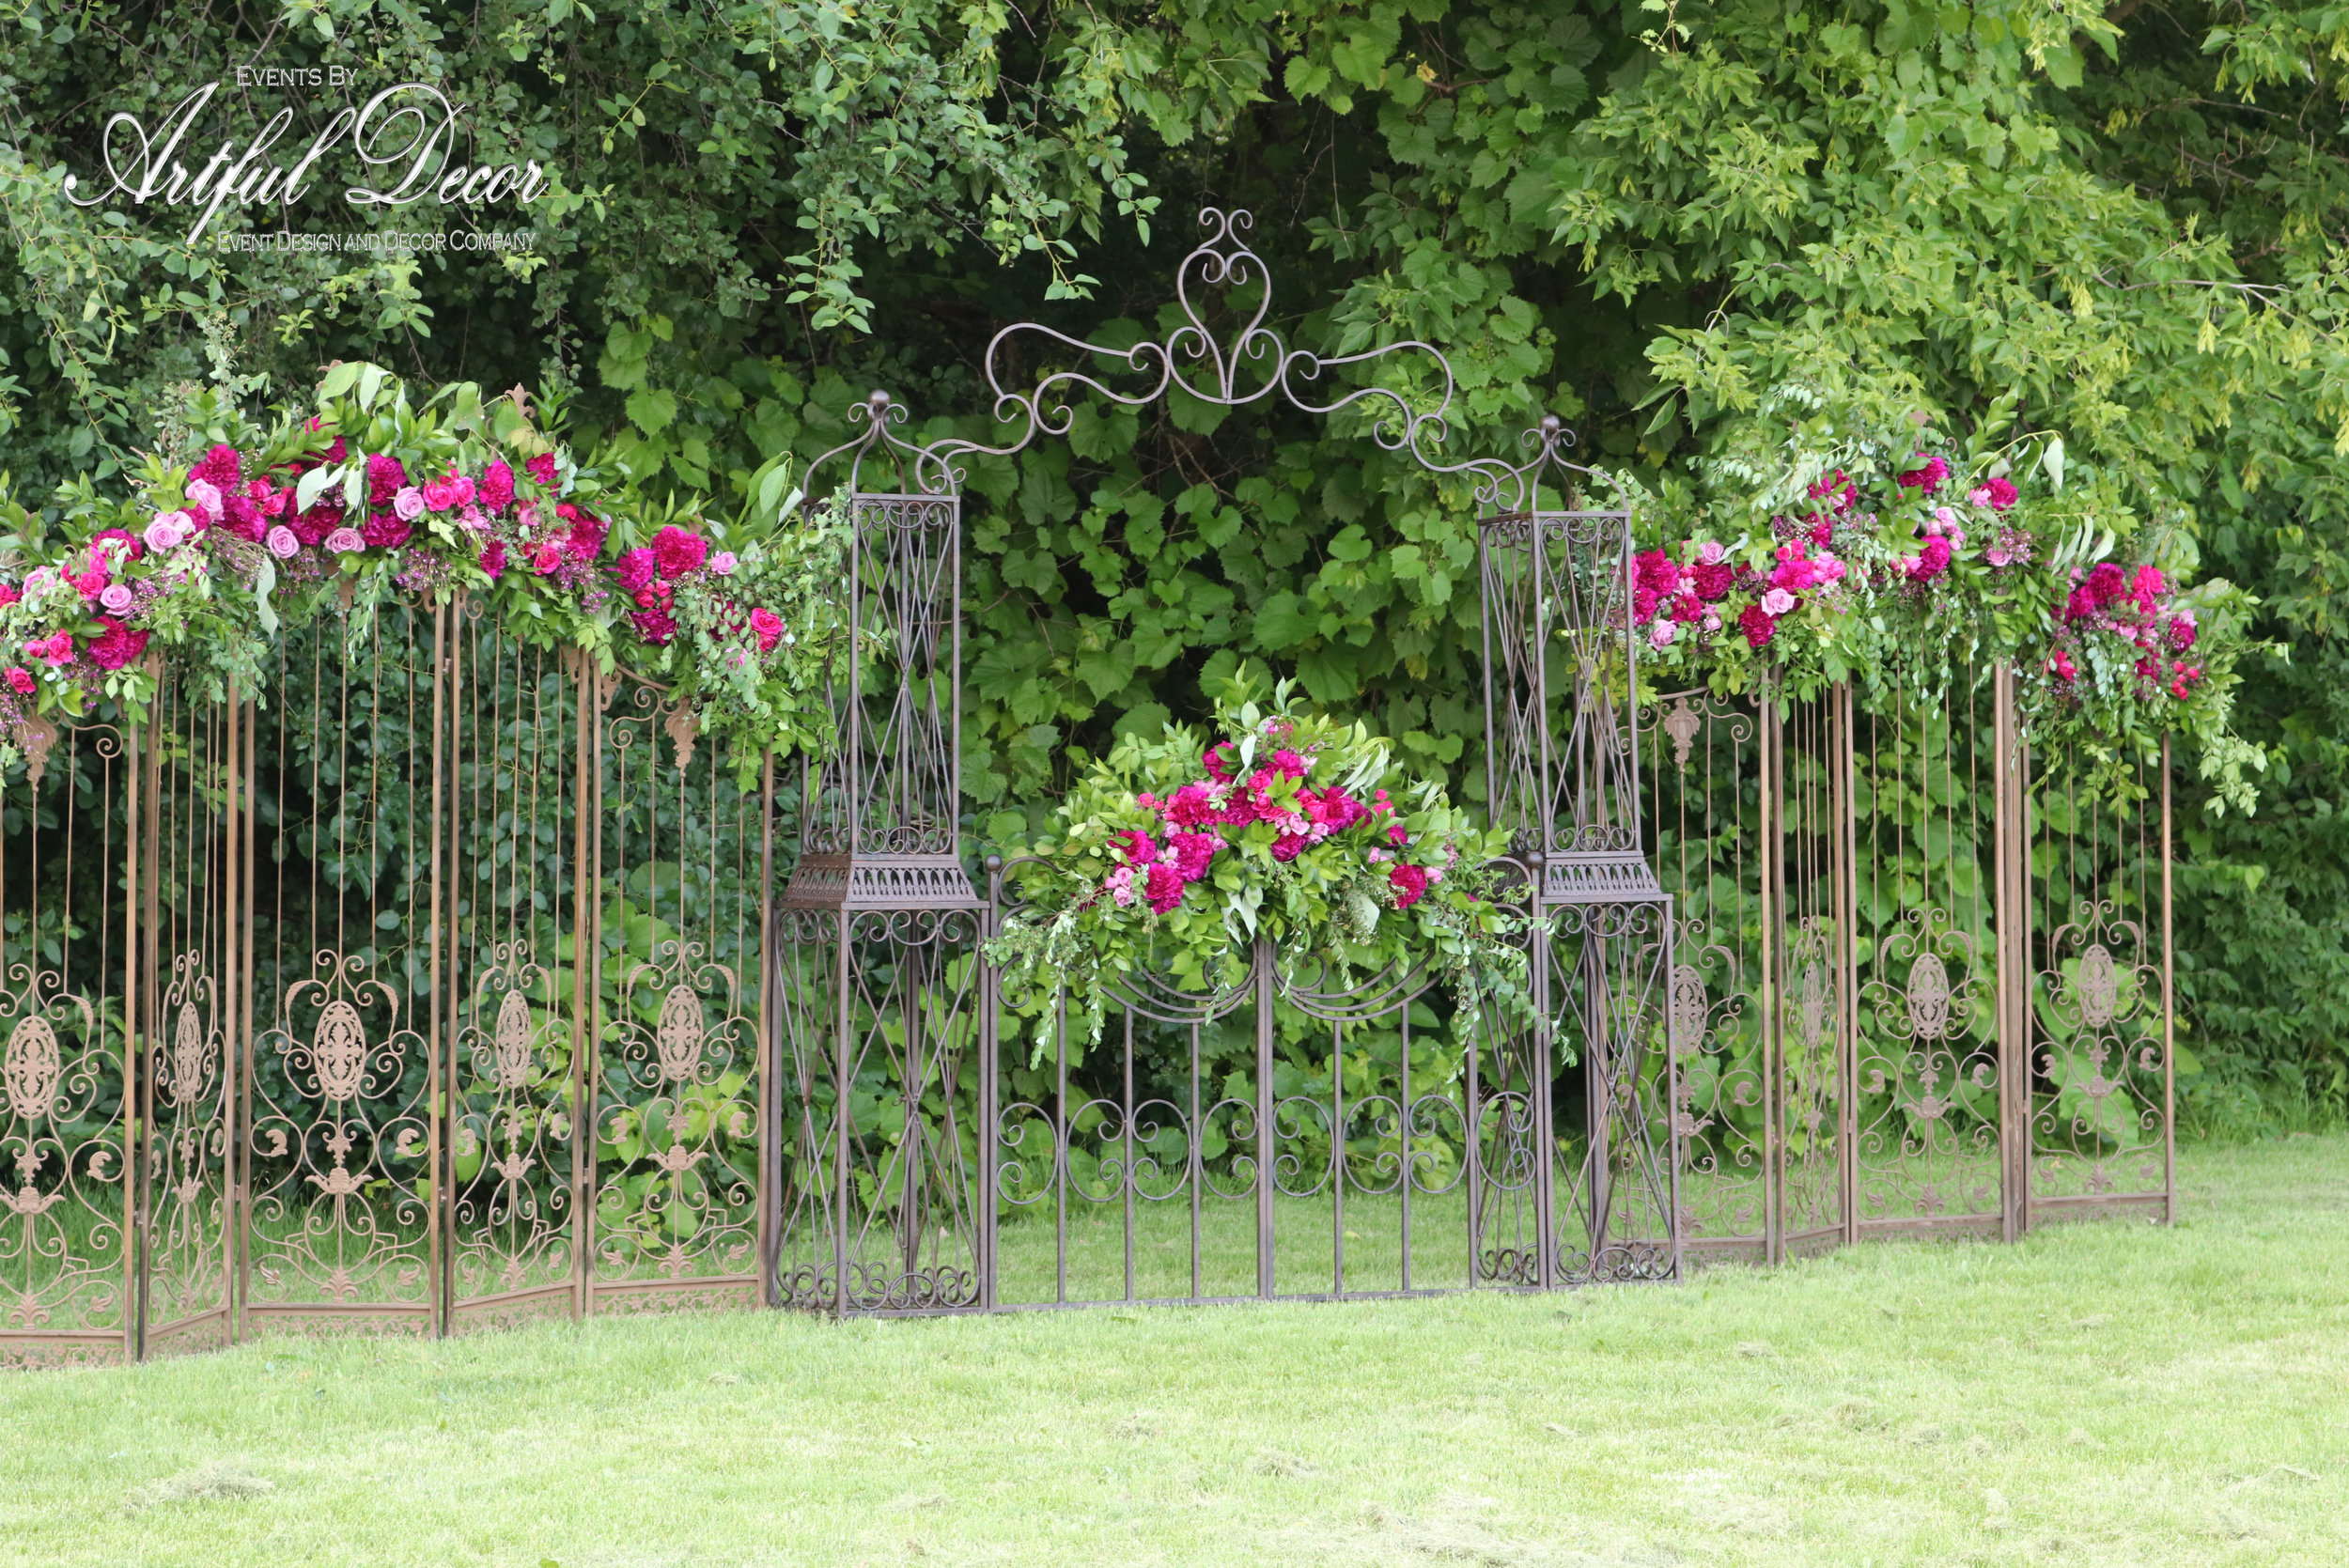 Garden Gate 13 Copyright.jpg